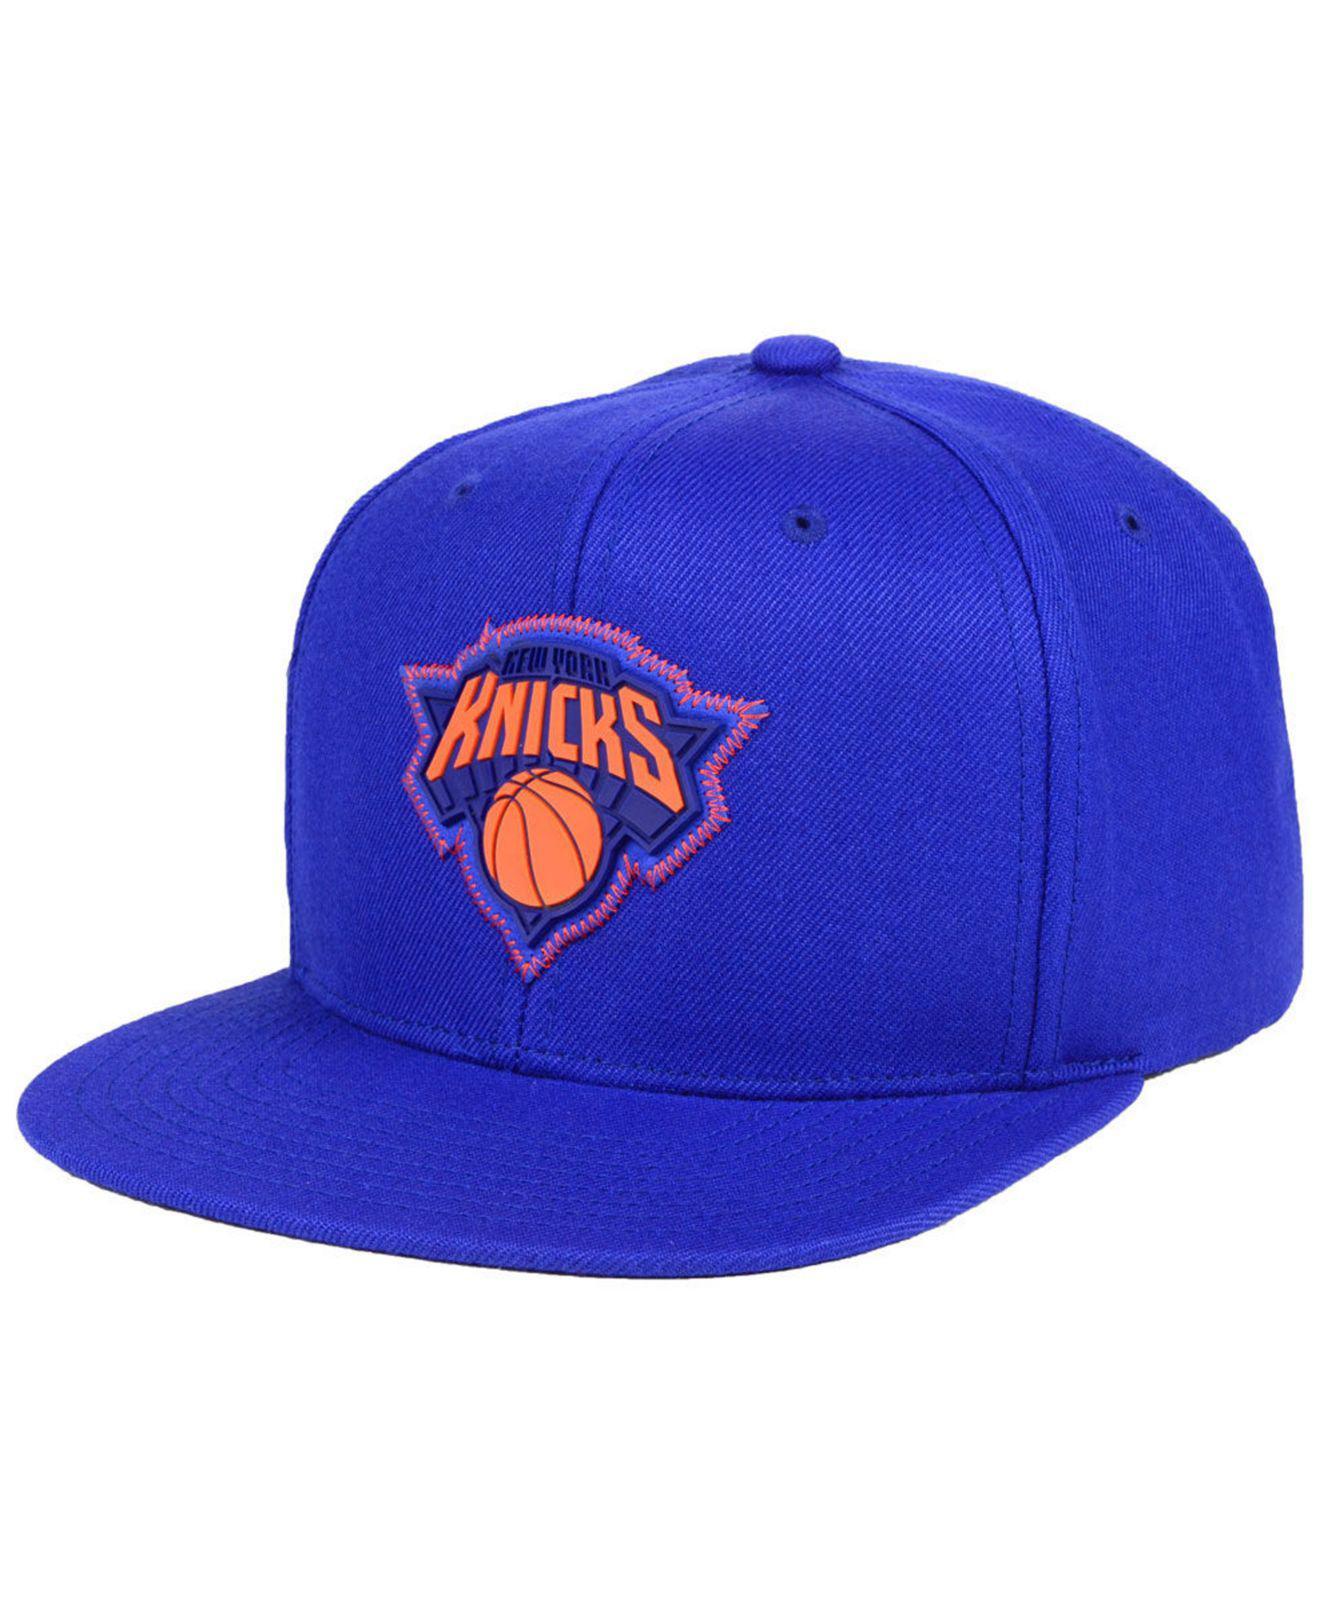 904cae8199b Lyst - Mitchell   Ness New York Knicks Zig Zag Snapback Cap in Blue ...